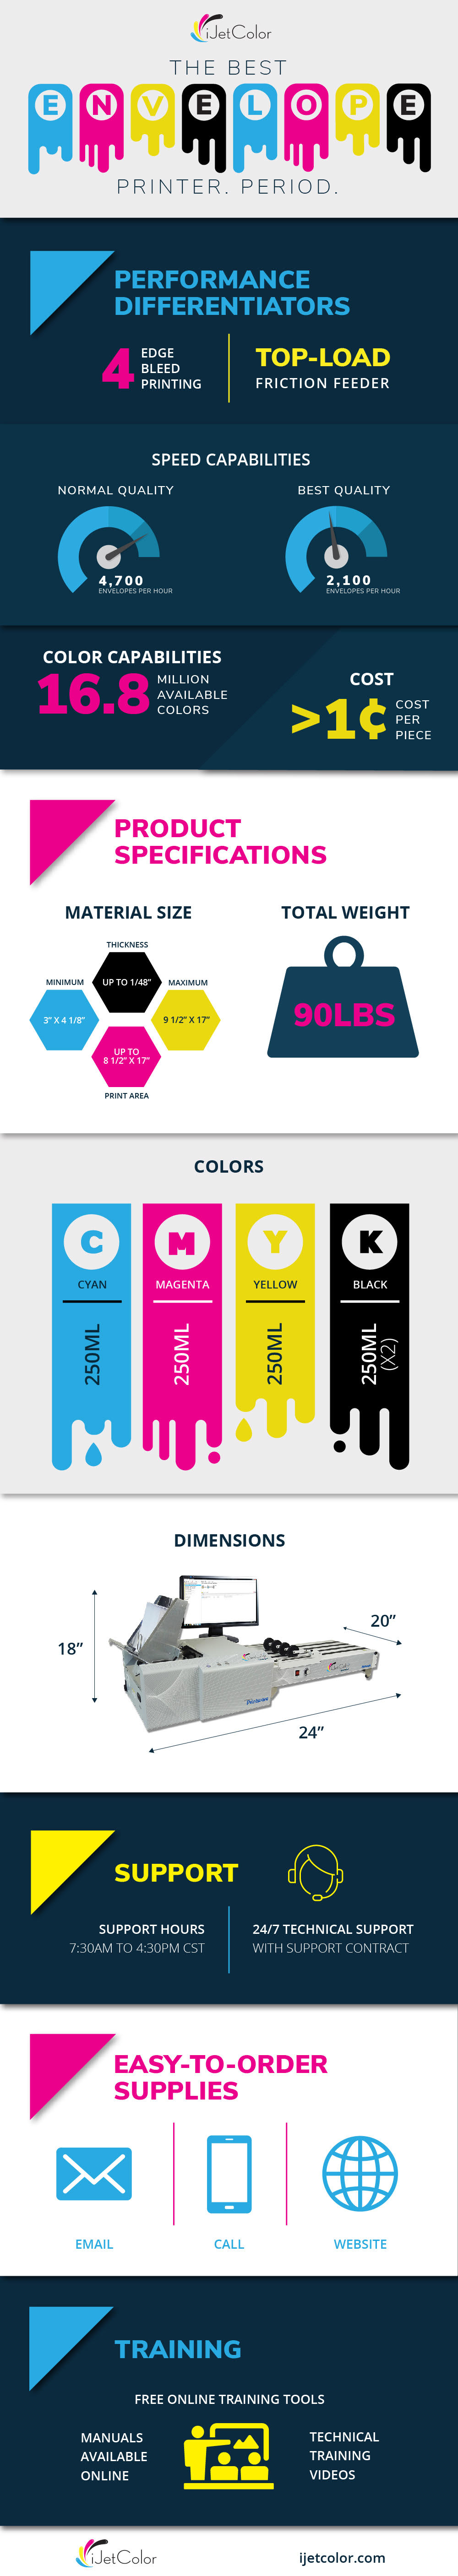 ijetcolor differentiators infographic.jpg